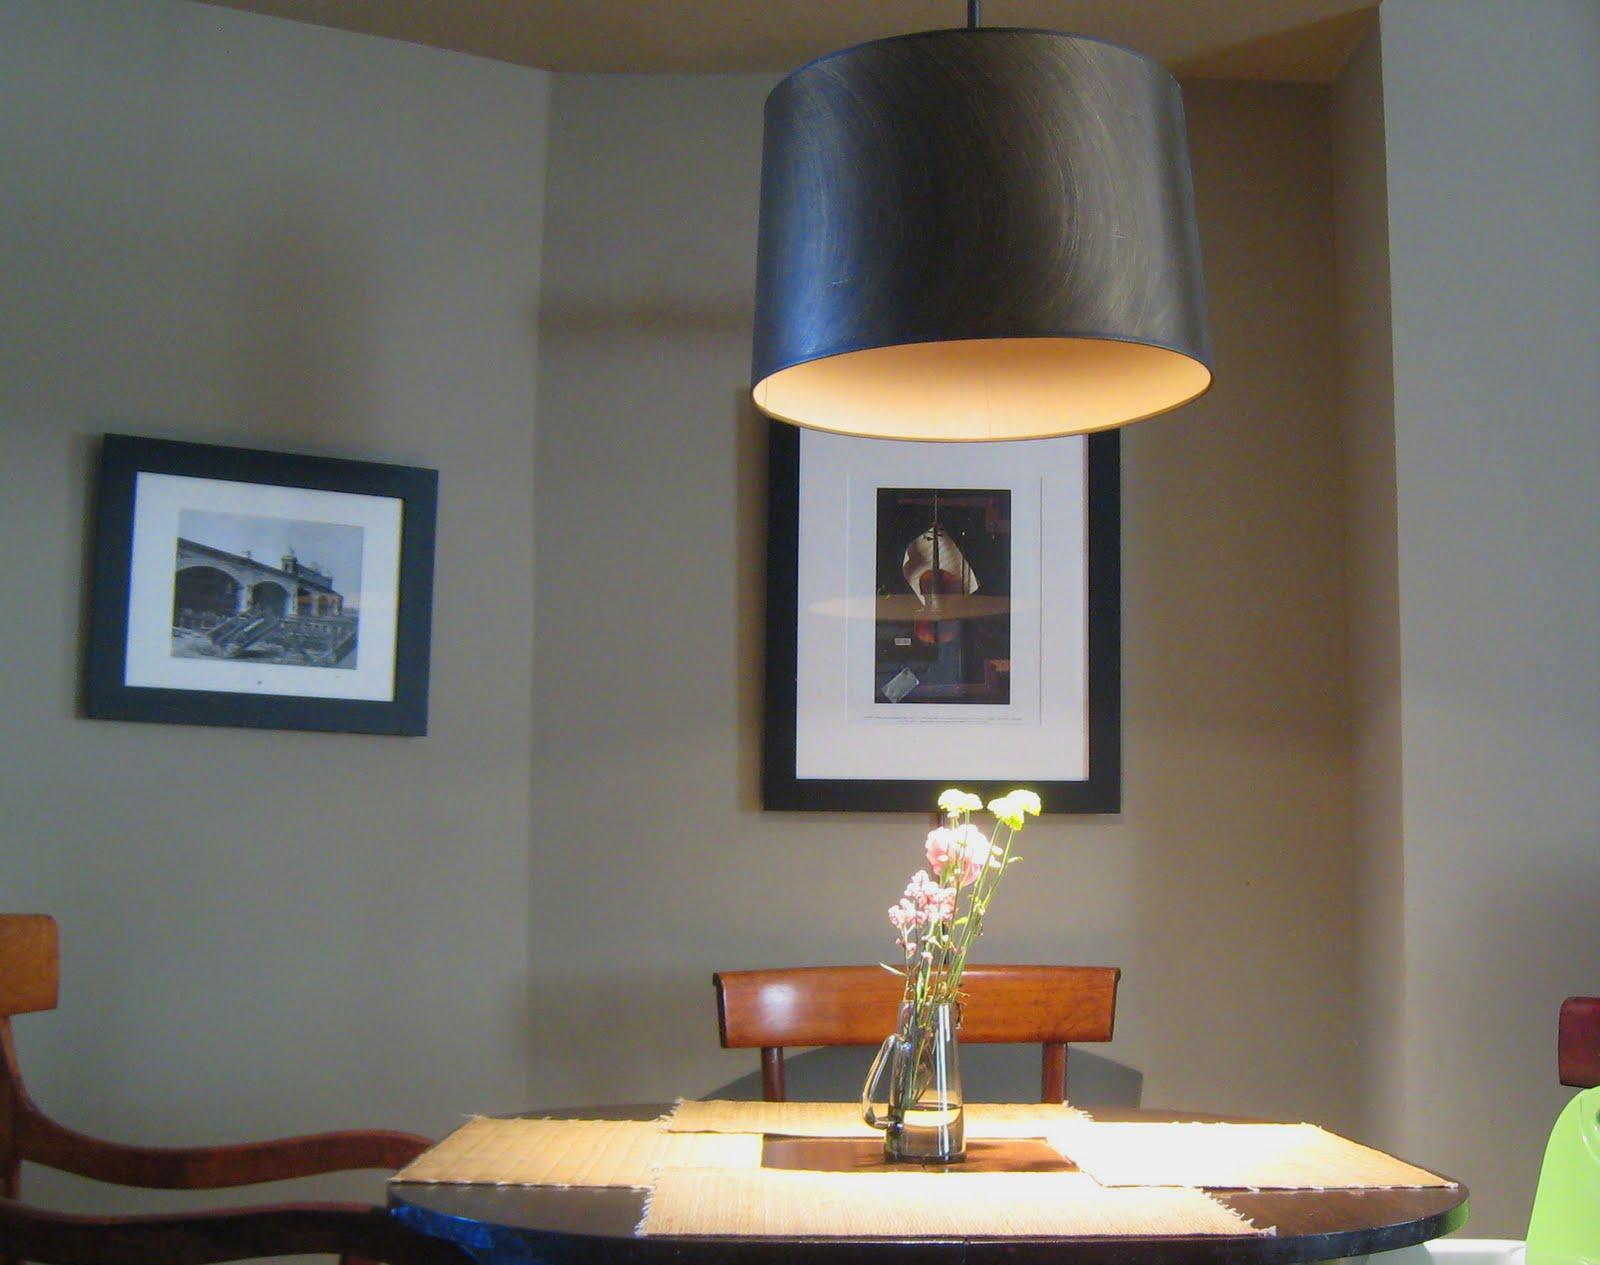 Over Dining Table Lighting - Bestsciaticatreatments.com